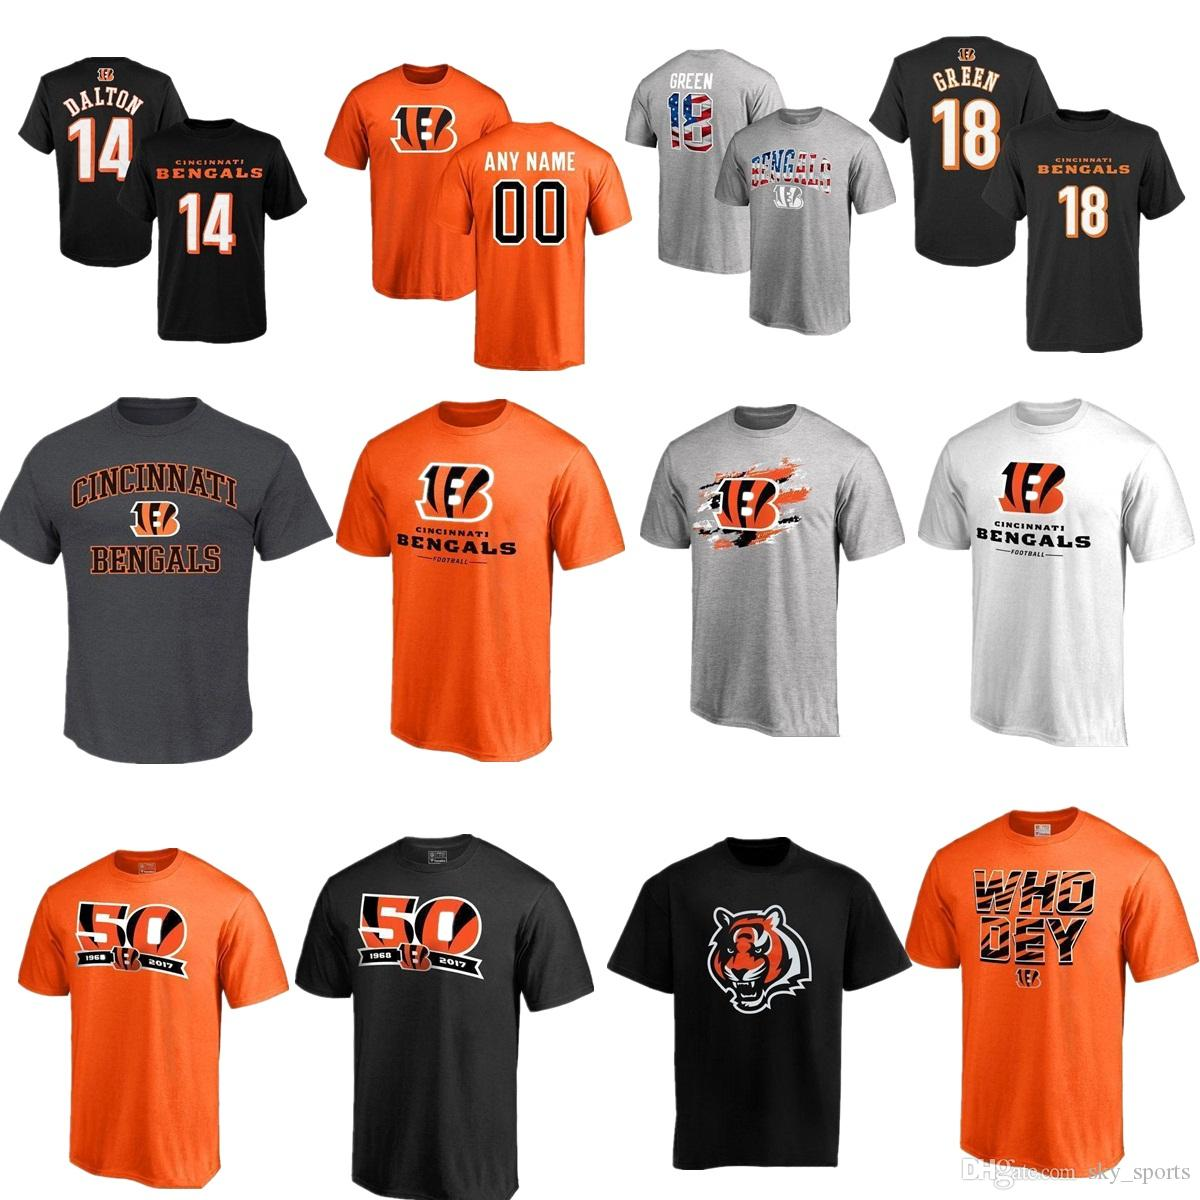 2e62931a Men's Cincinnati Bengal 18 A.J. Green 55 Vontaze Burfict 85 Tyler Eifert 14  Andy Dalton Name & Number Logo 50th Anniversary T-Shirt